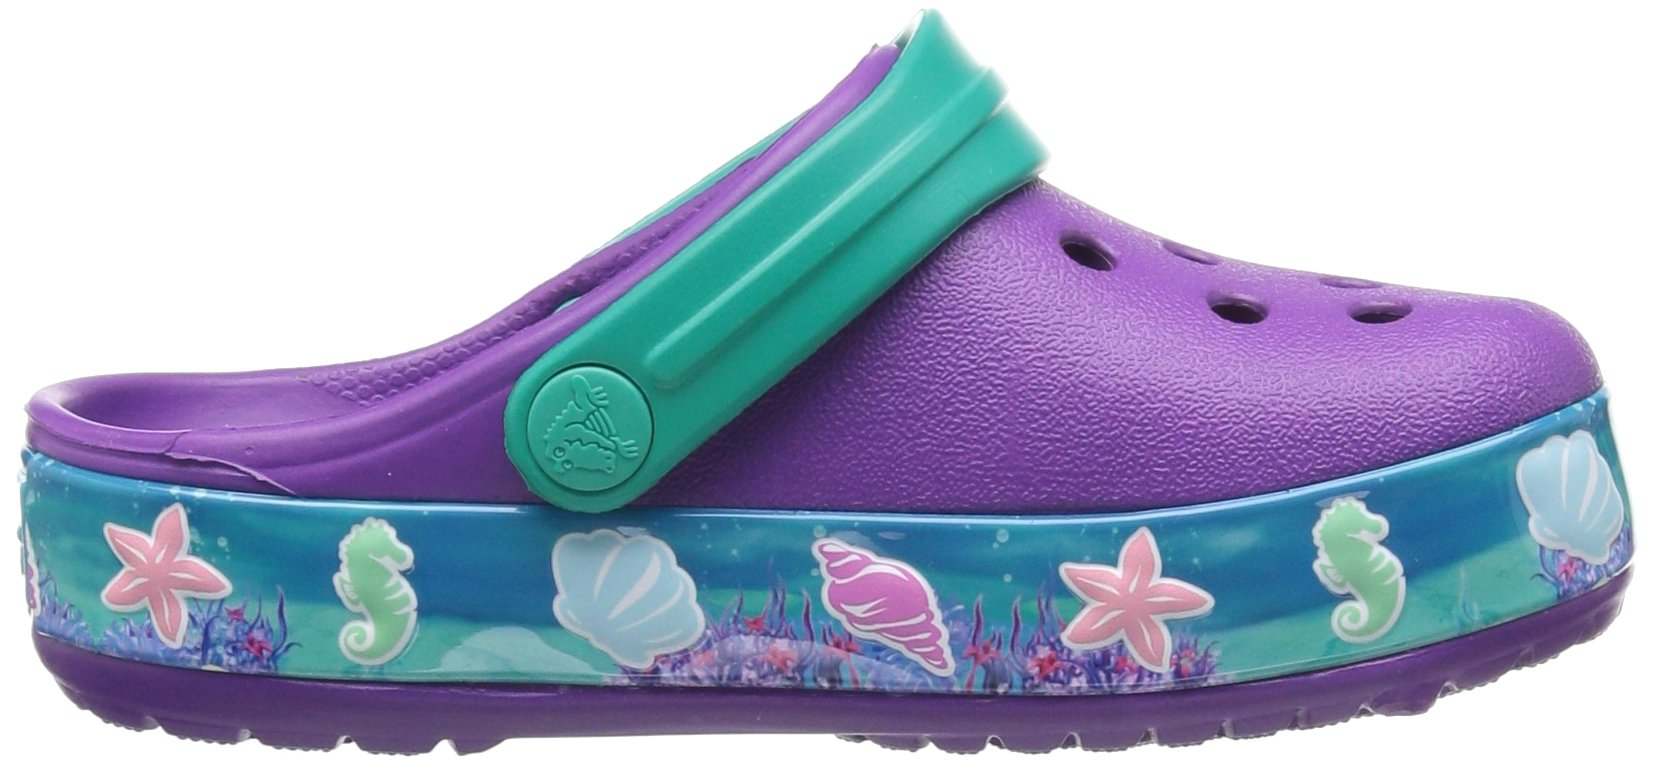 Crocs Girls' CB Princess Ariel K Clog, Amethyst, 13 M US Little Kid by Crocs (Image #7)